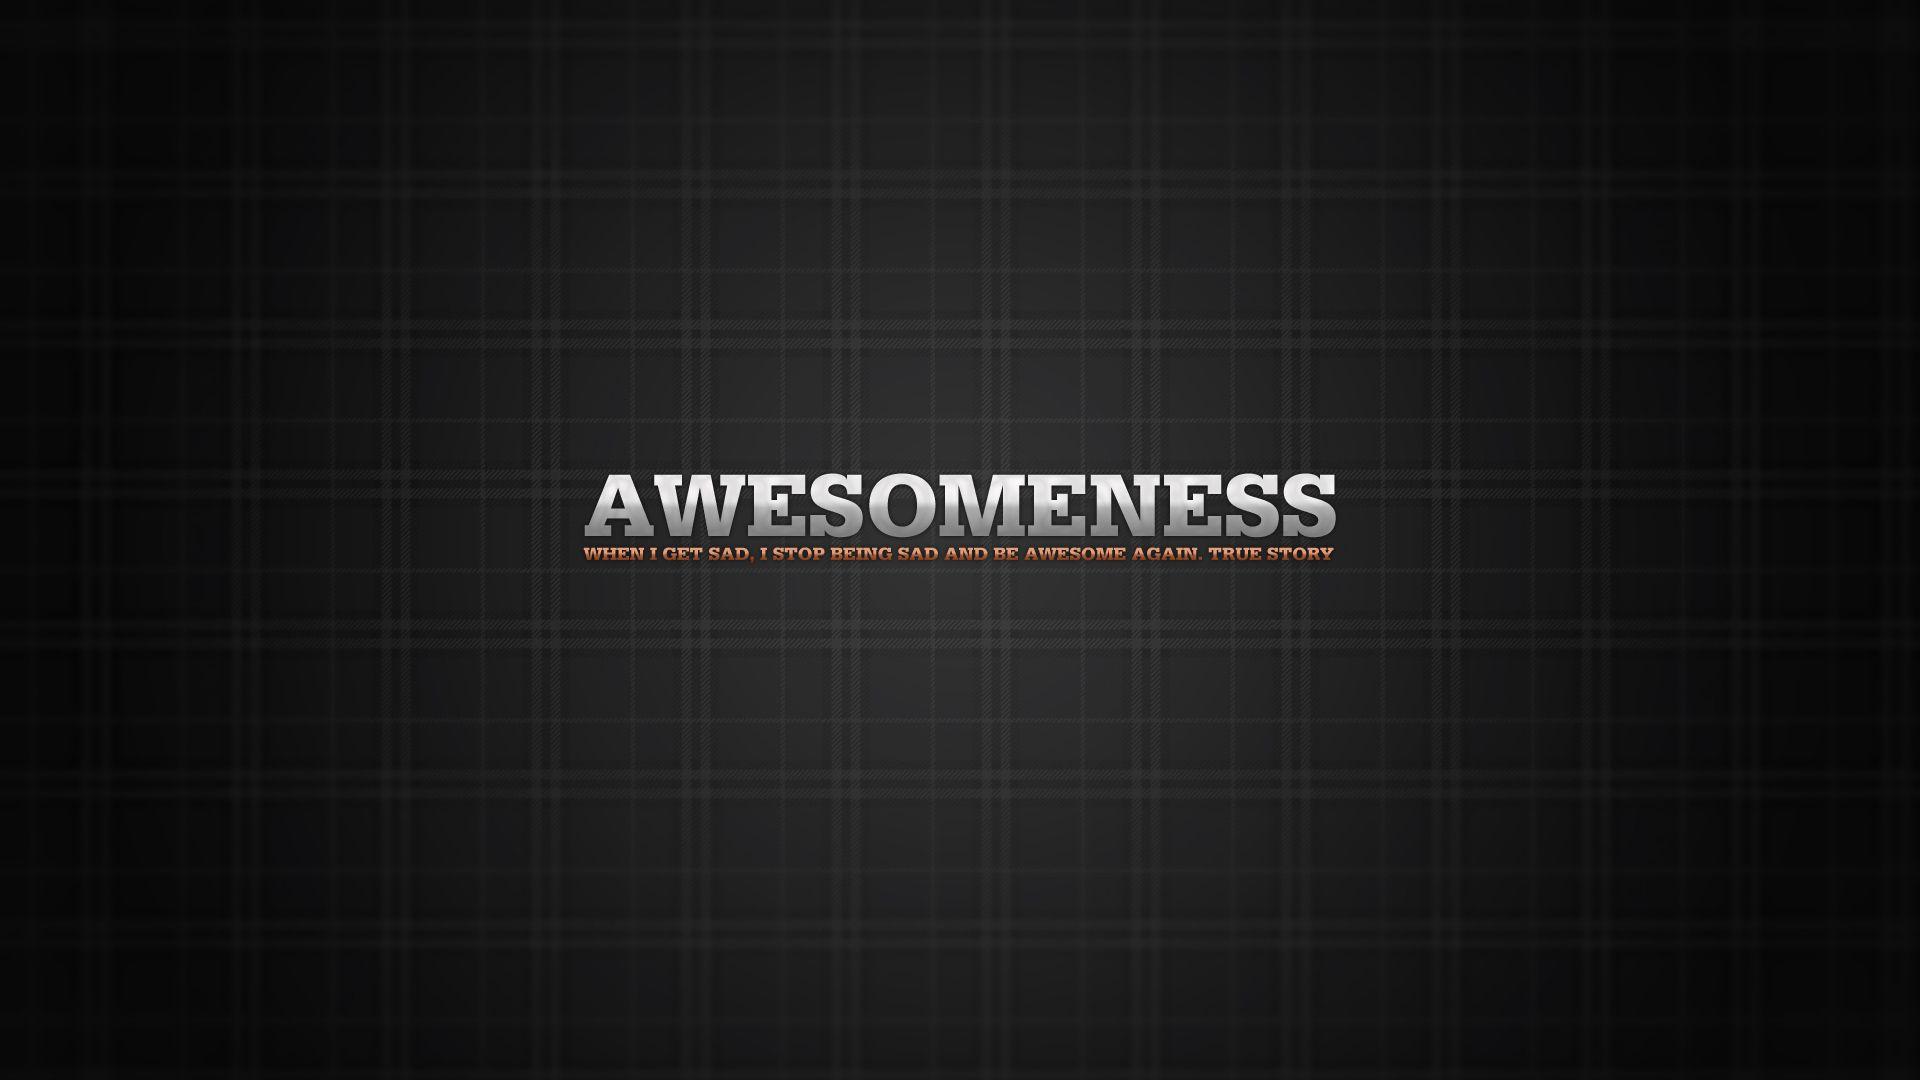 Awesome Biti Cool Wallpaper Hd Pozadine Check More At Http Pozadine Info Humor Biti Cool Motivational Quotes Wallpaper Fun Quotes Funny Funny Quotes